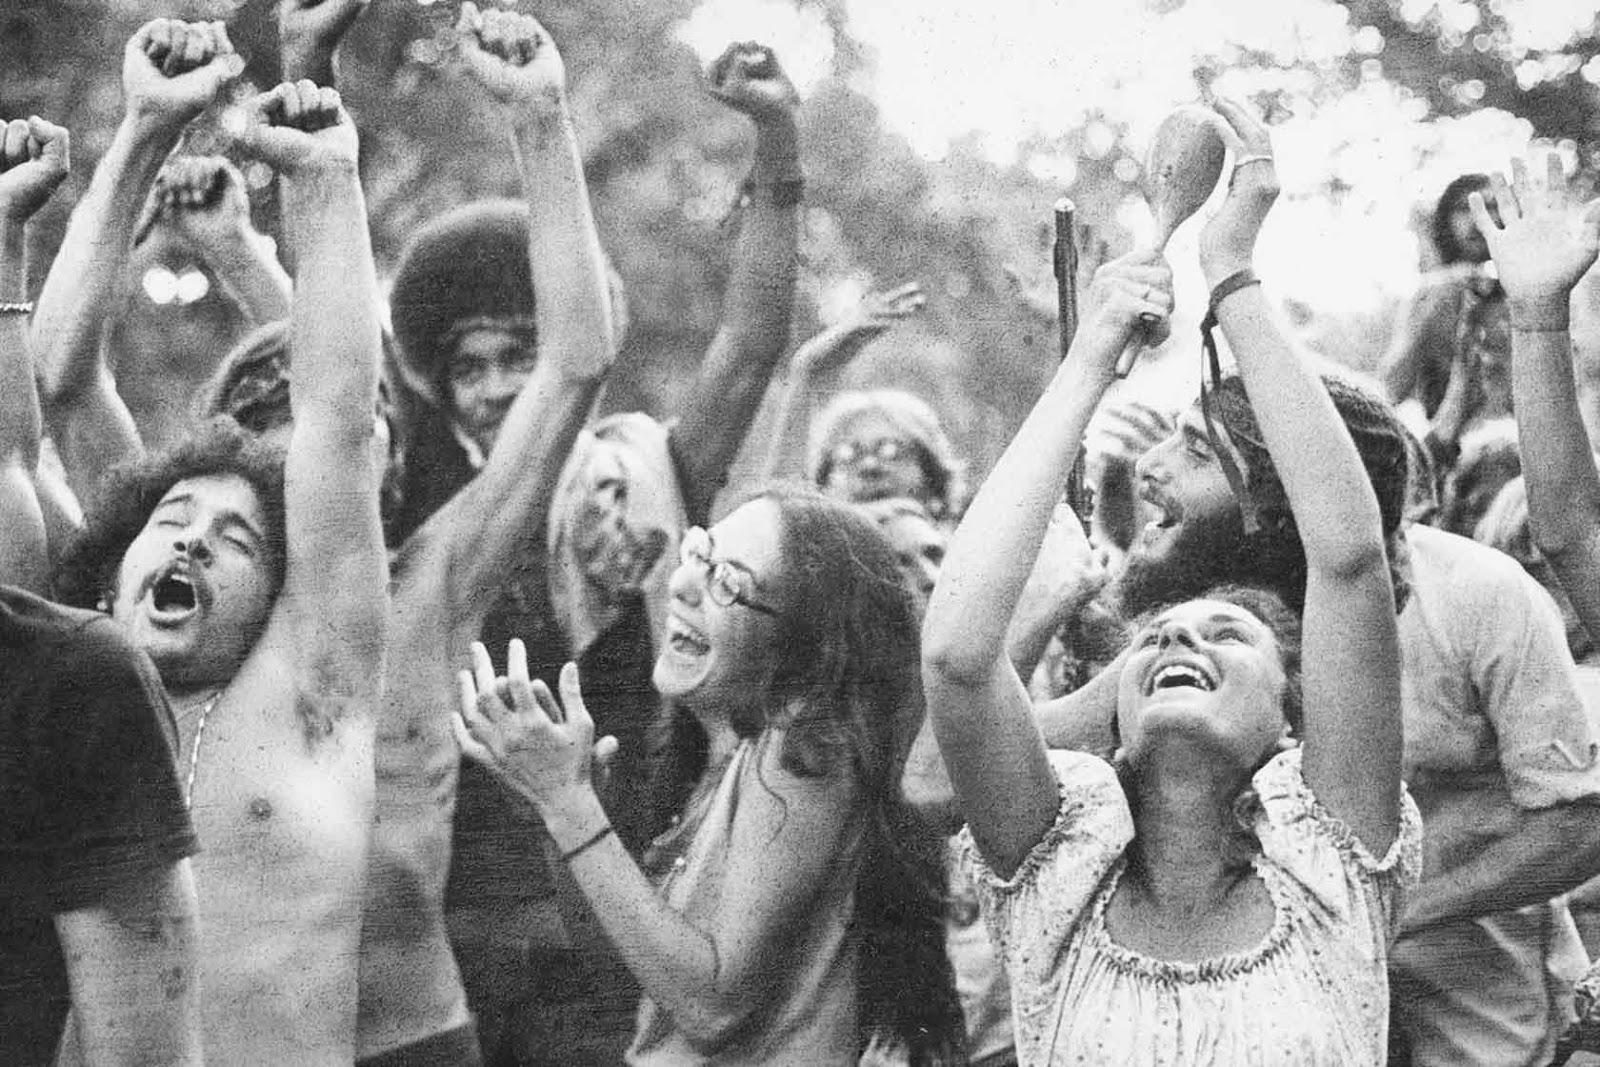 sex Woodstock photos